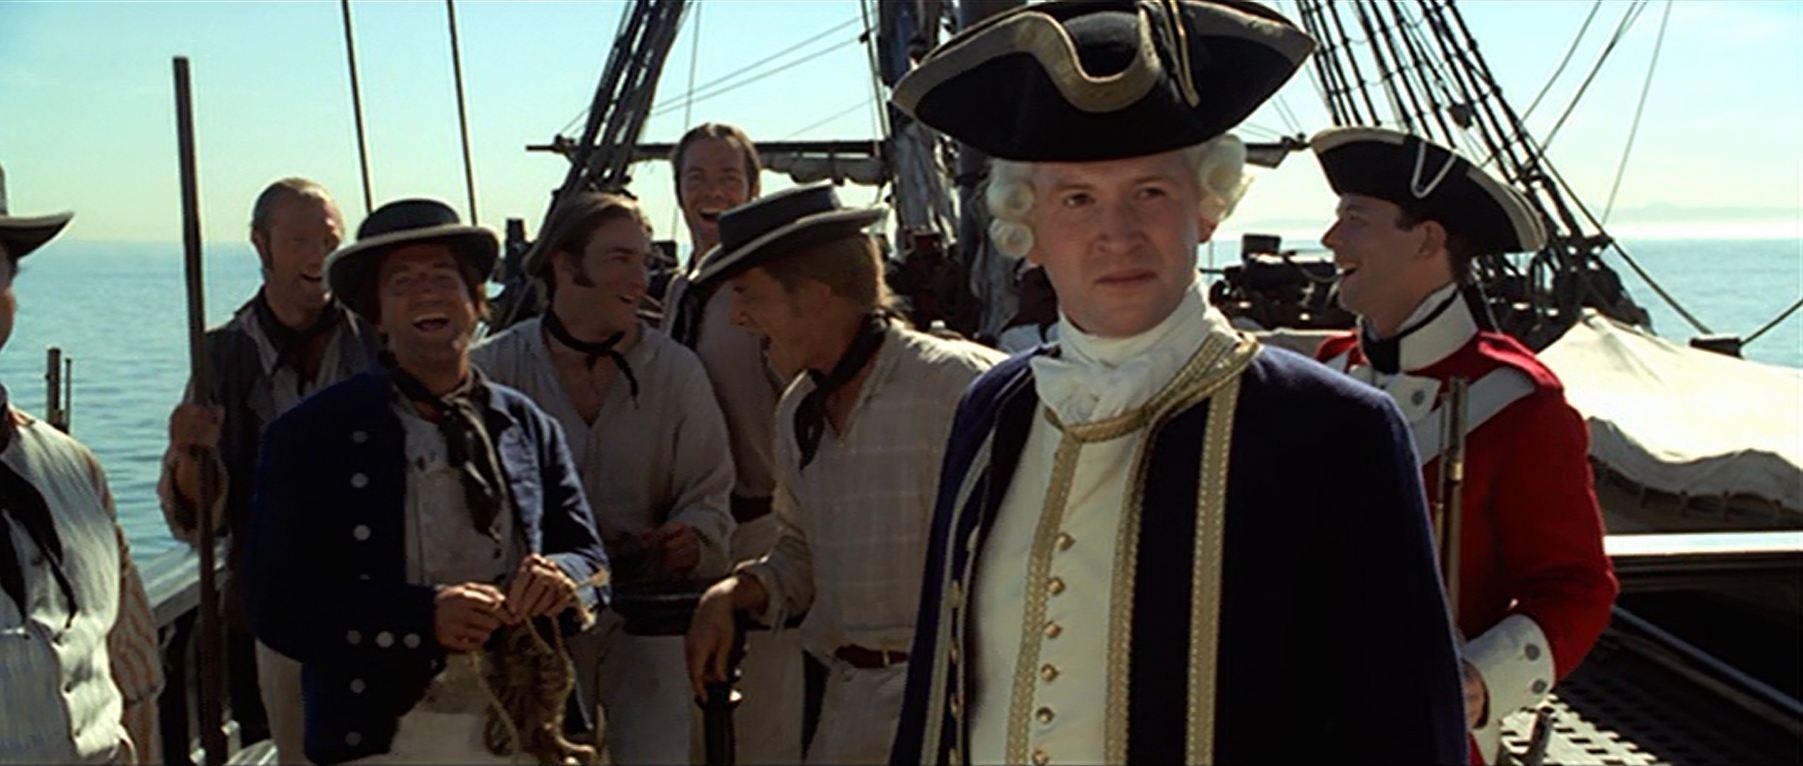 Crew der HMS Dauntless